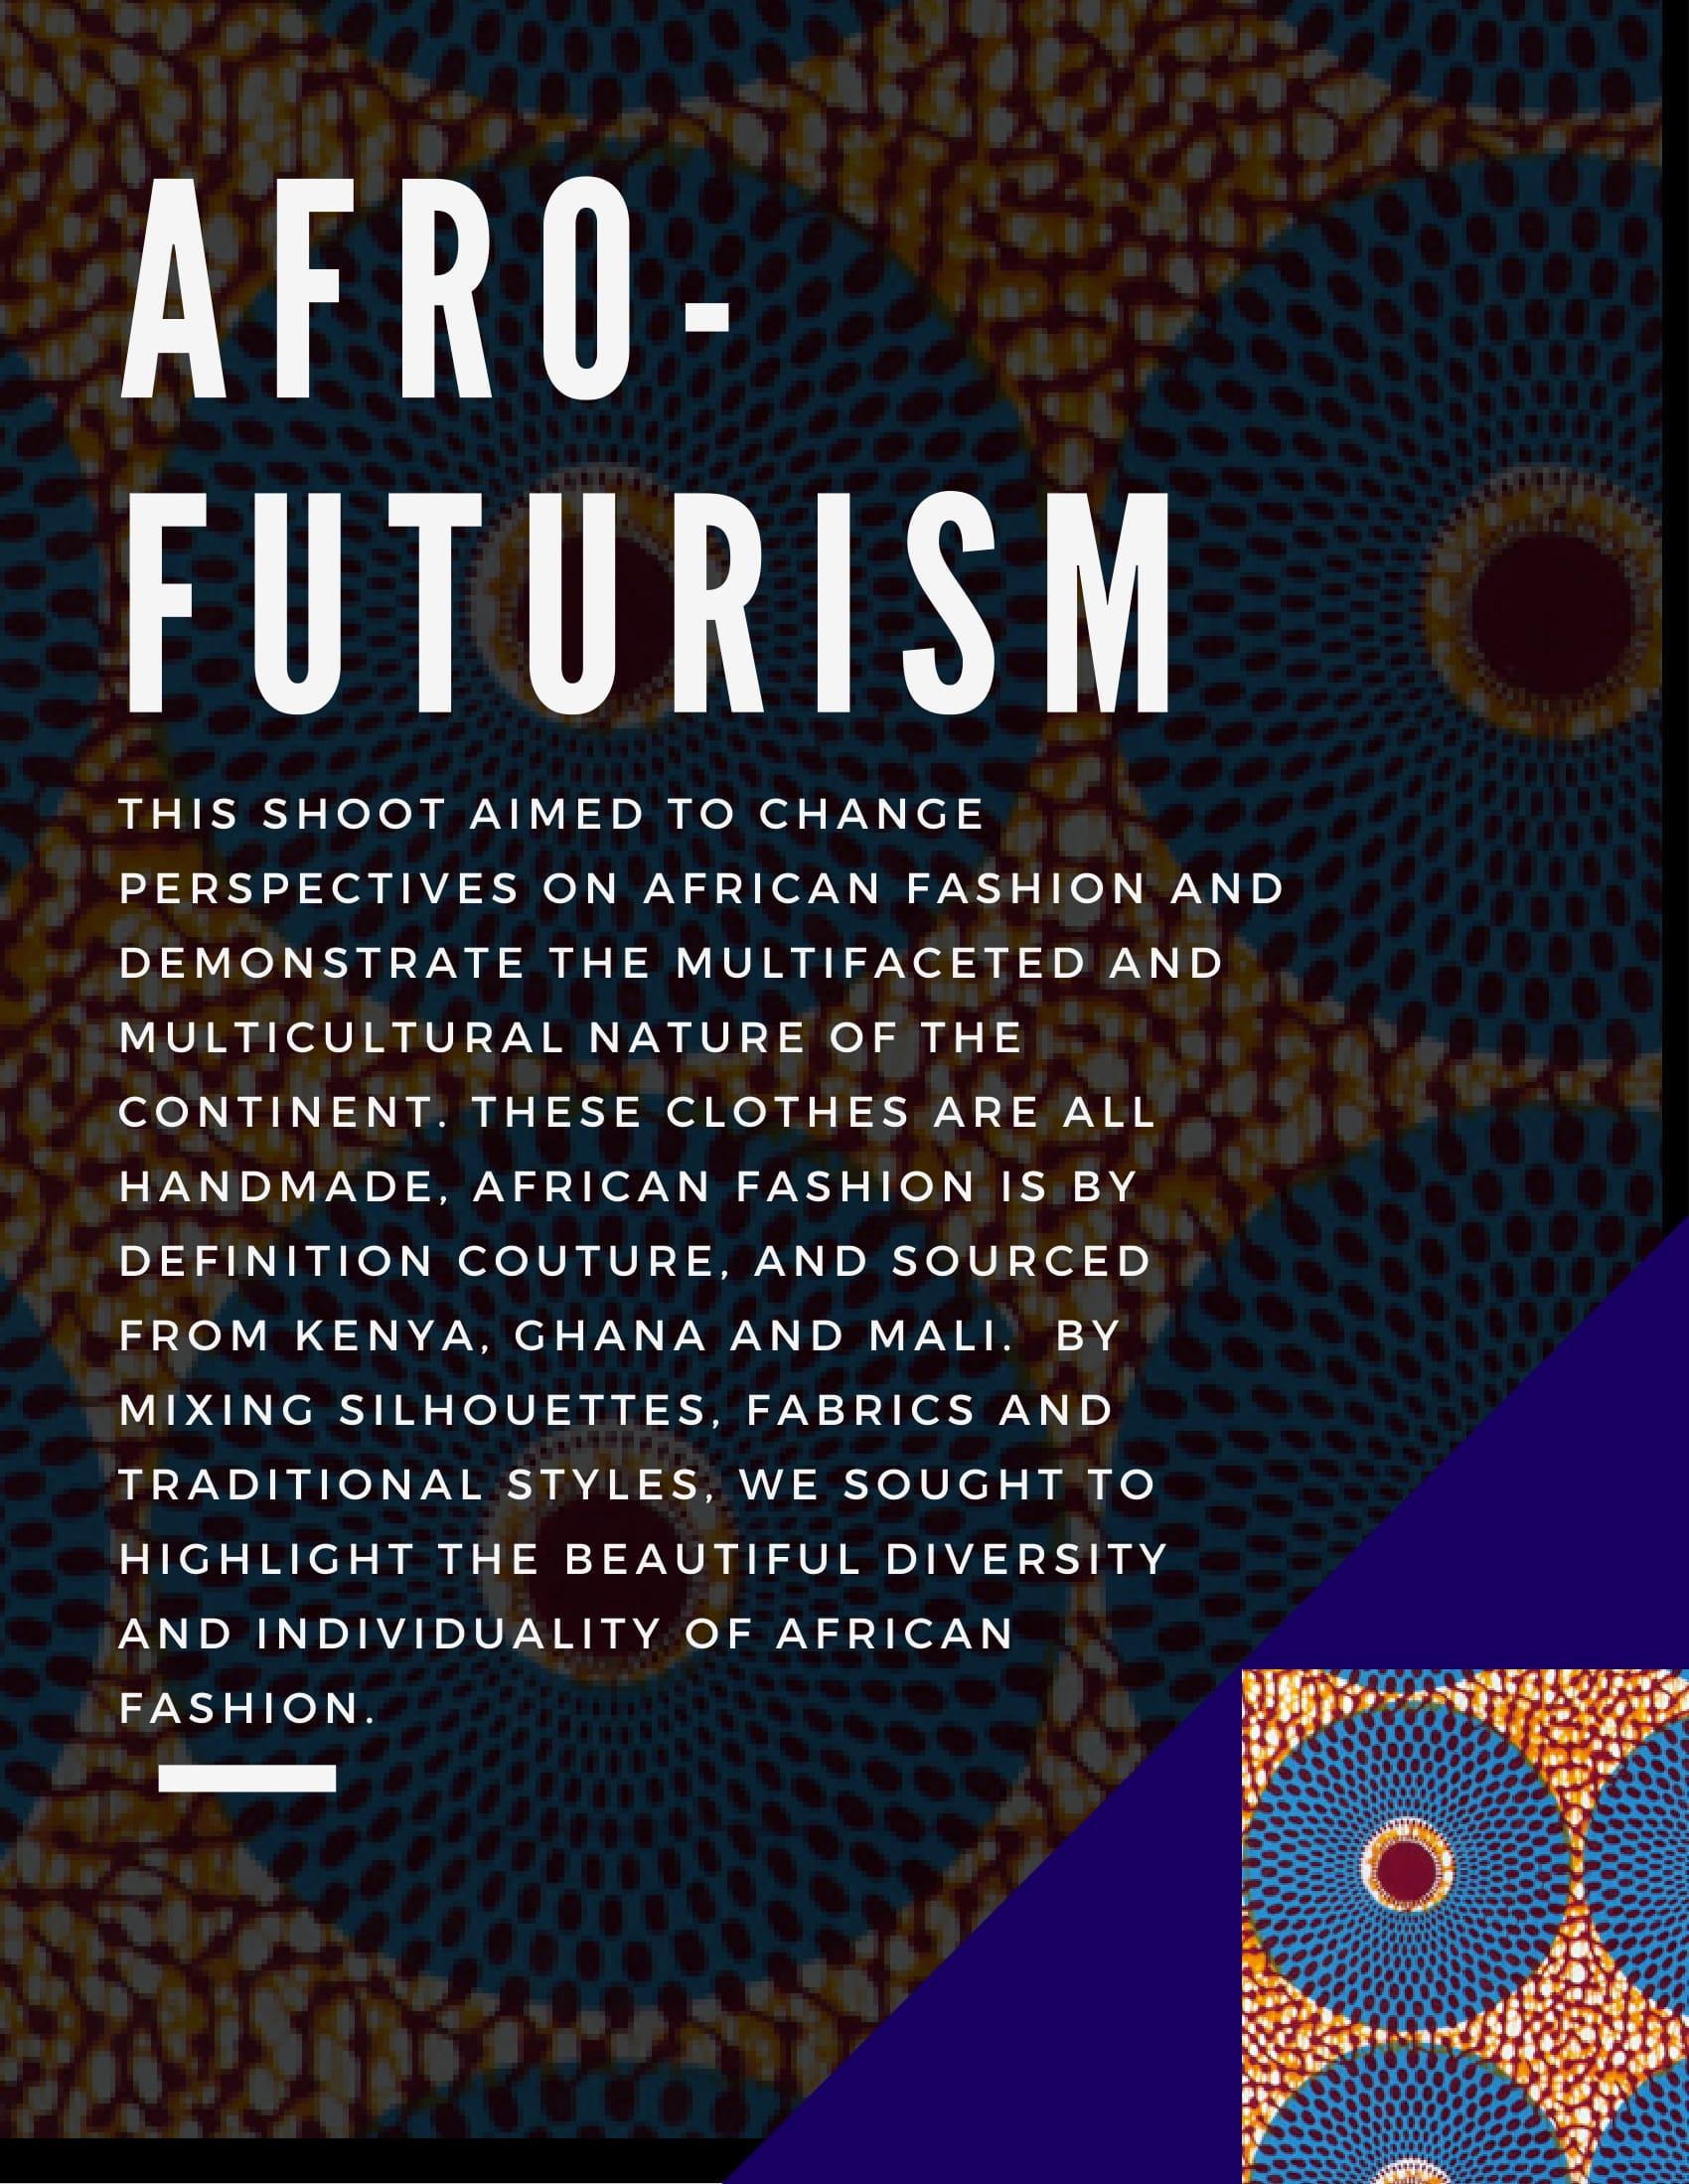 African Photoshoot-01.jpg